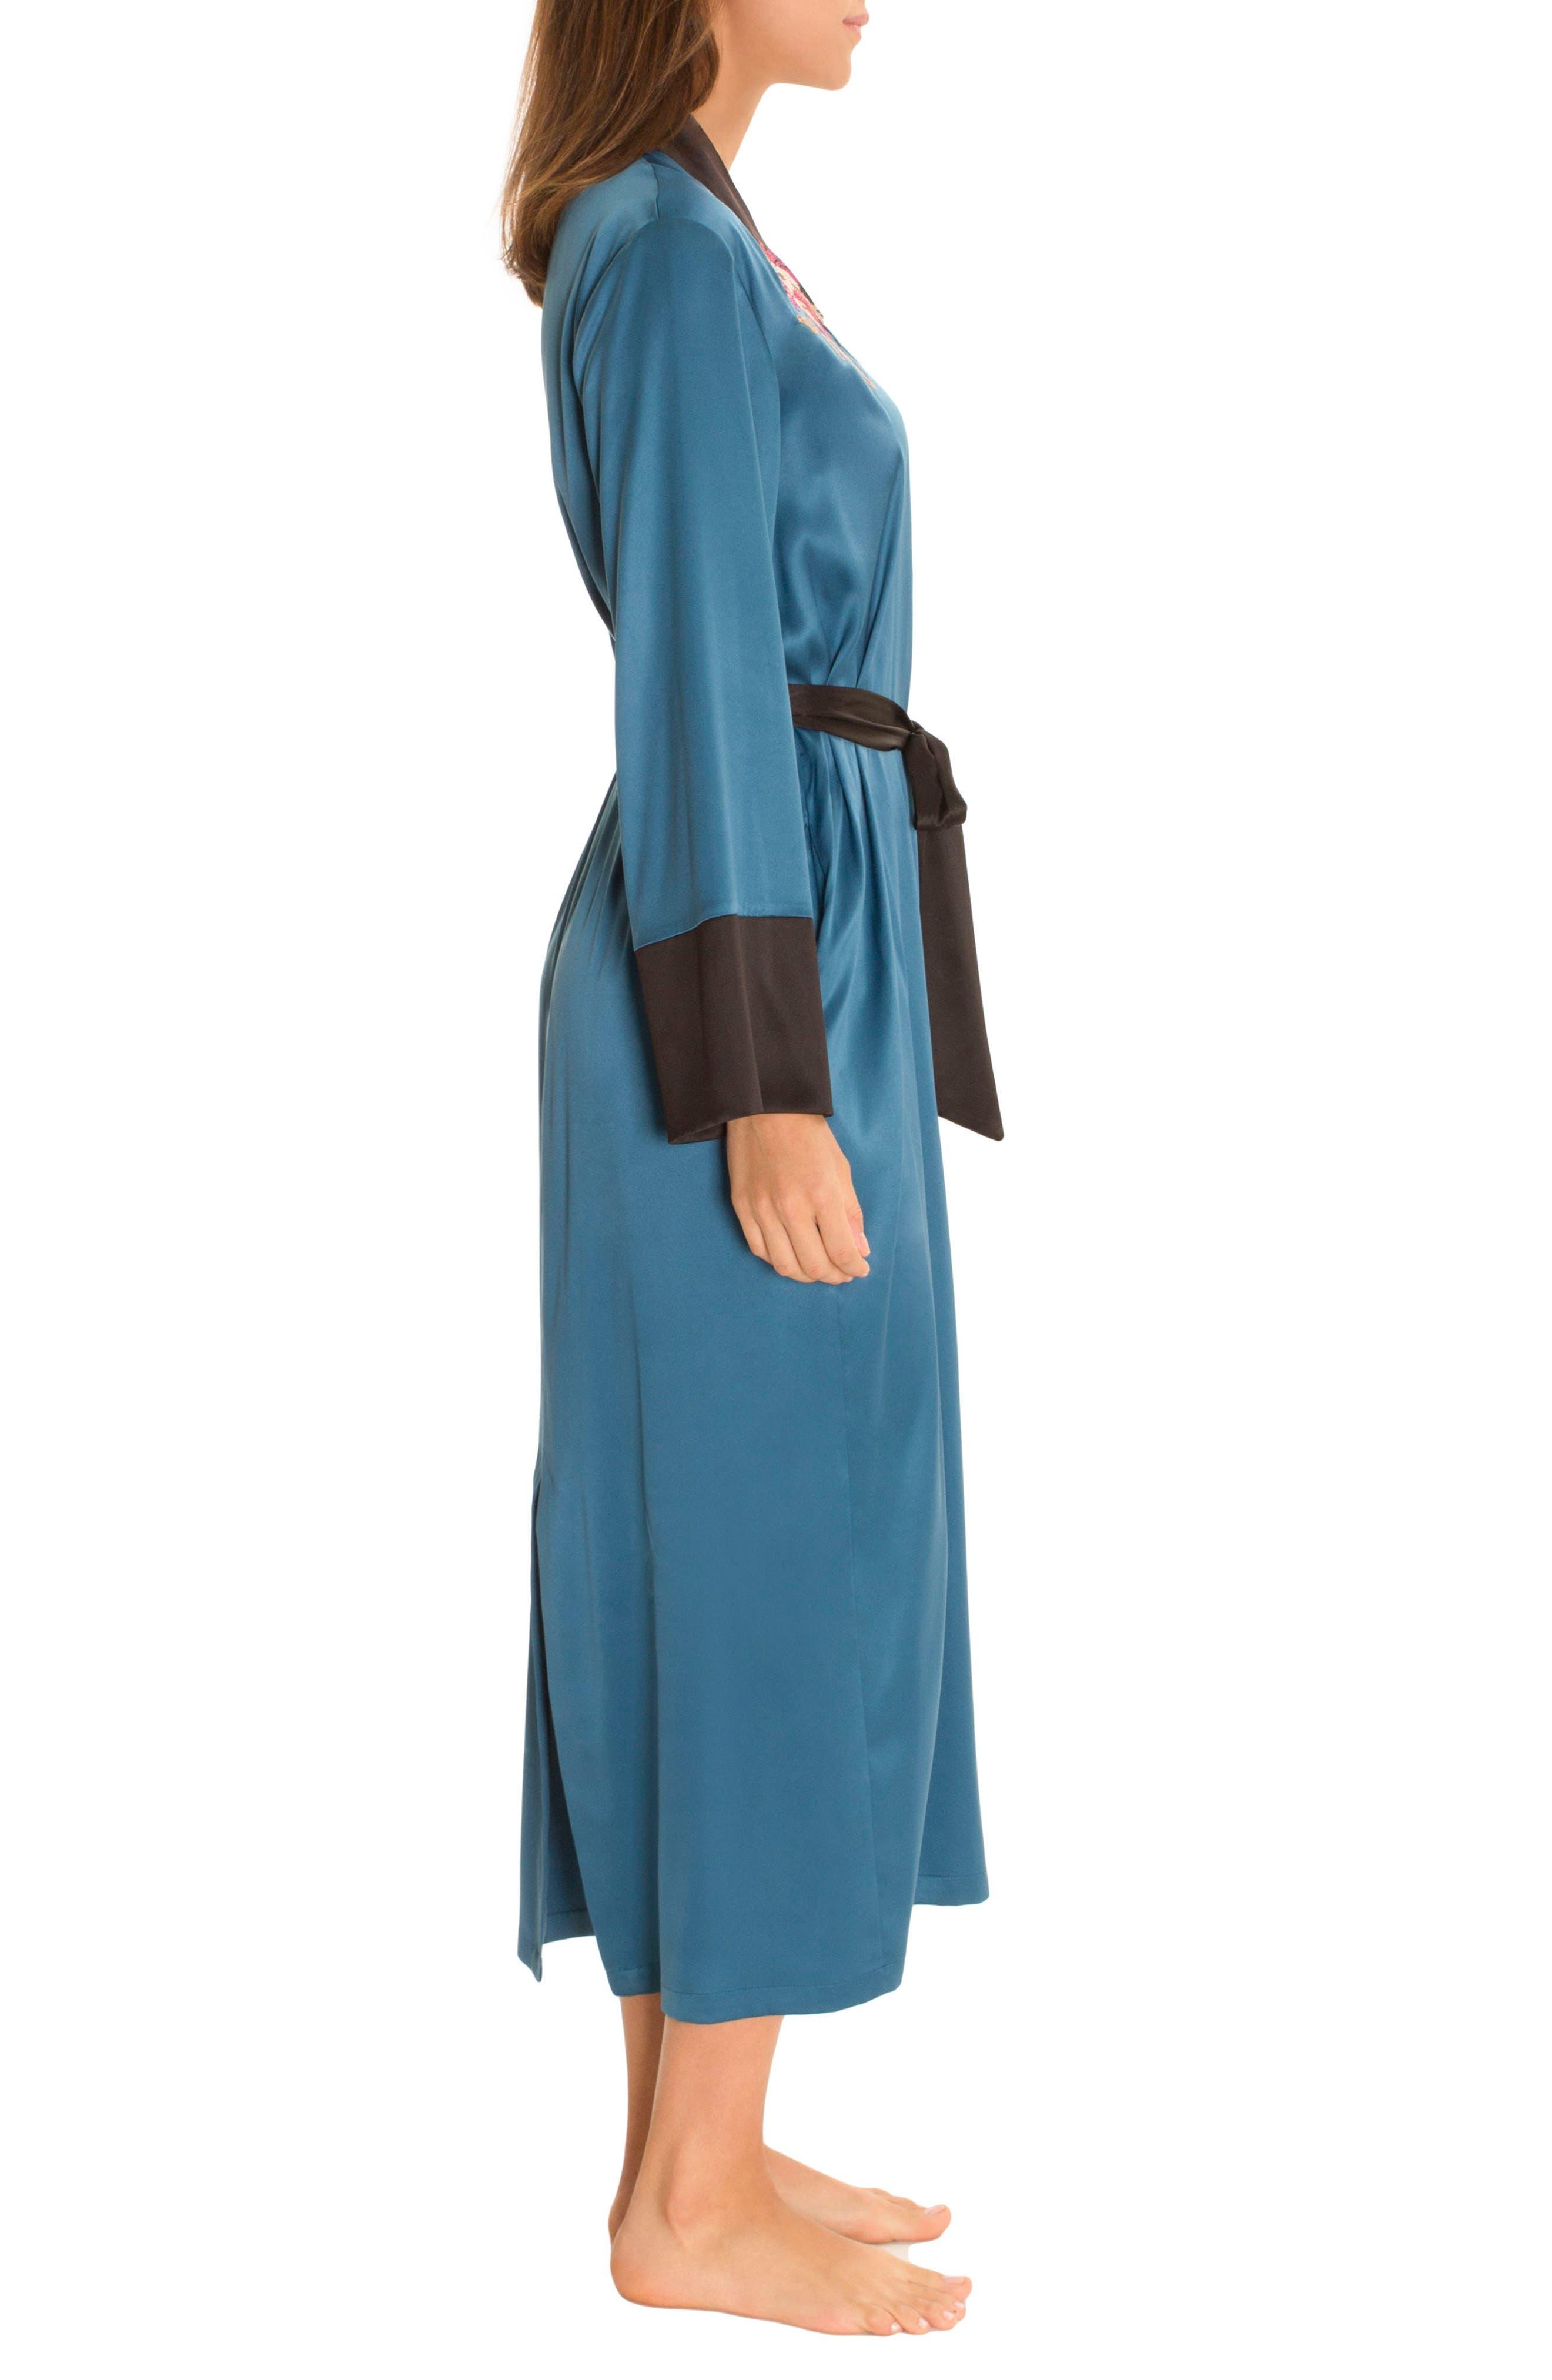 Kimono Robe,                             Alternate thumbnail 3, color,                             440